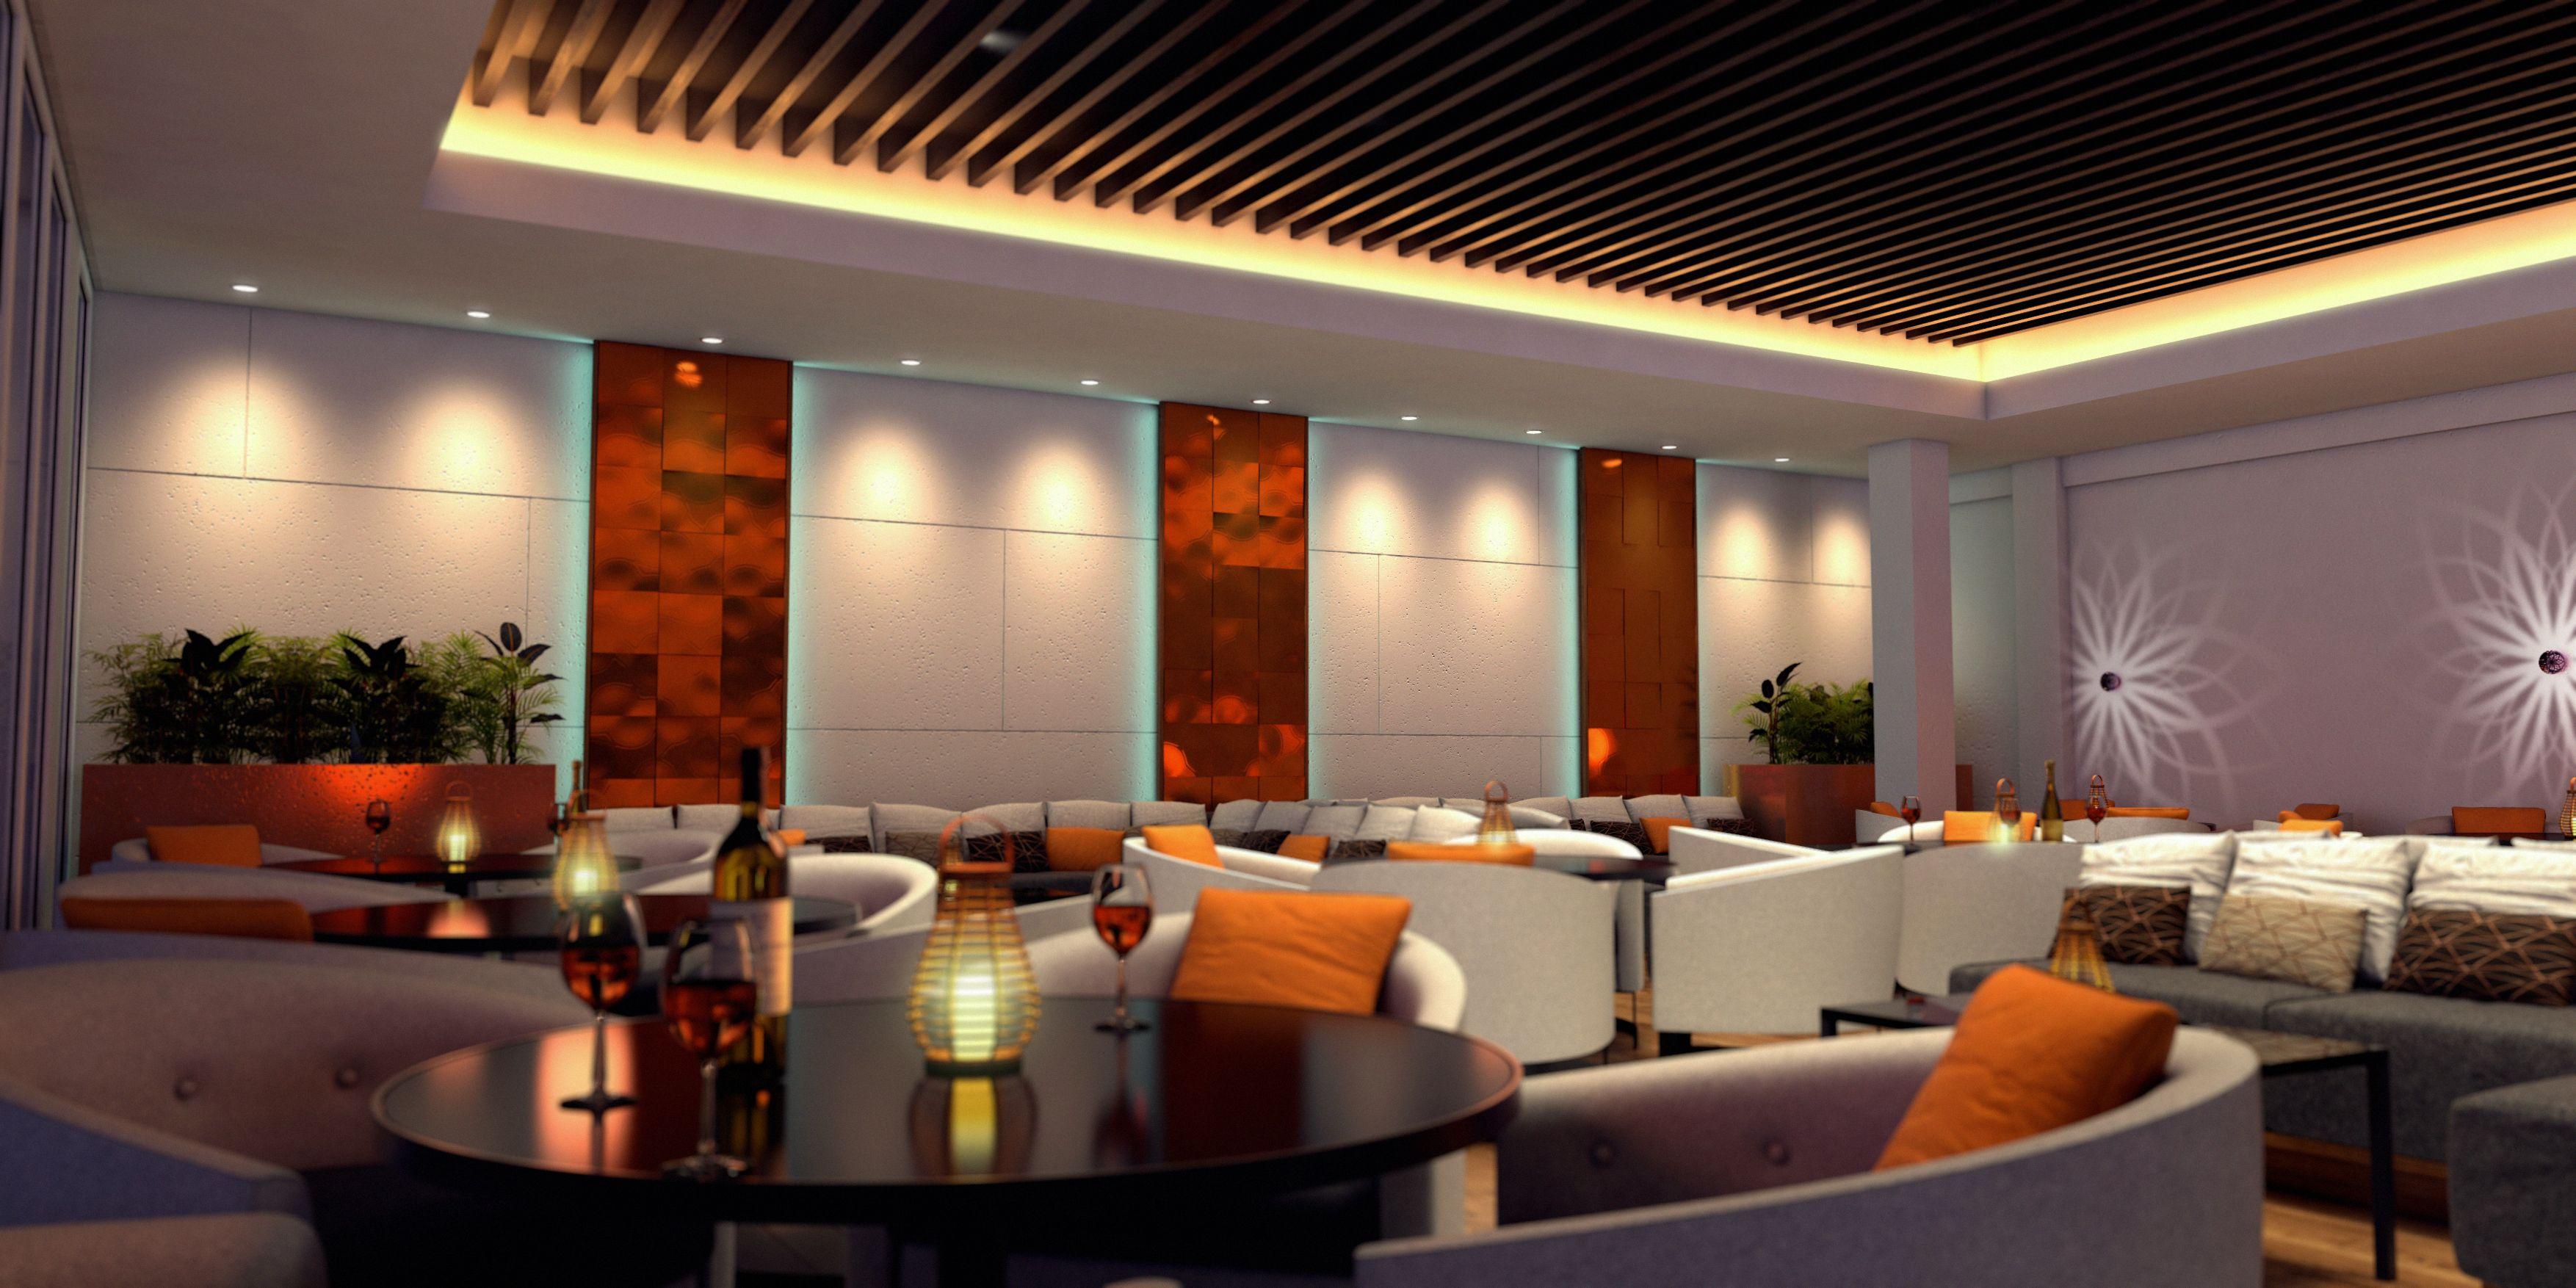 Design Restaurant Concept Development : Restaurants design concepts pixshark images